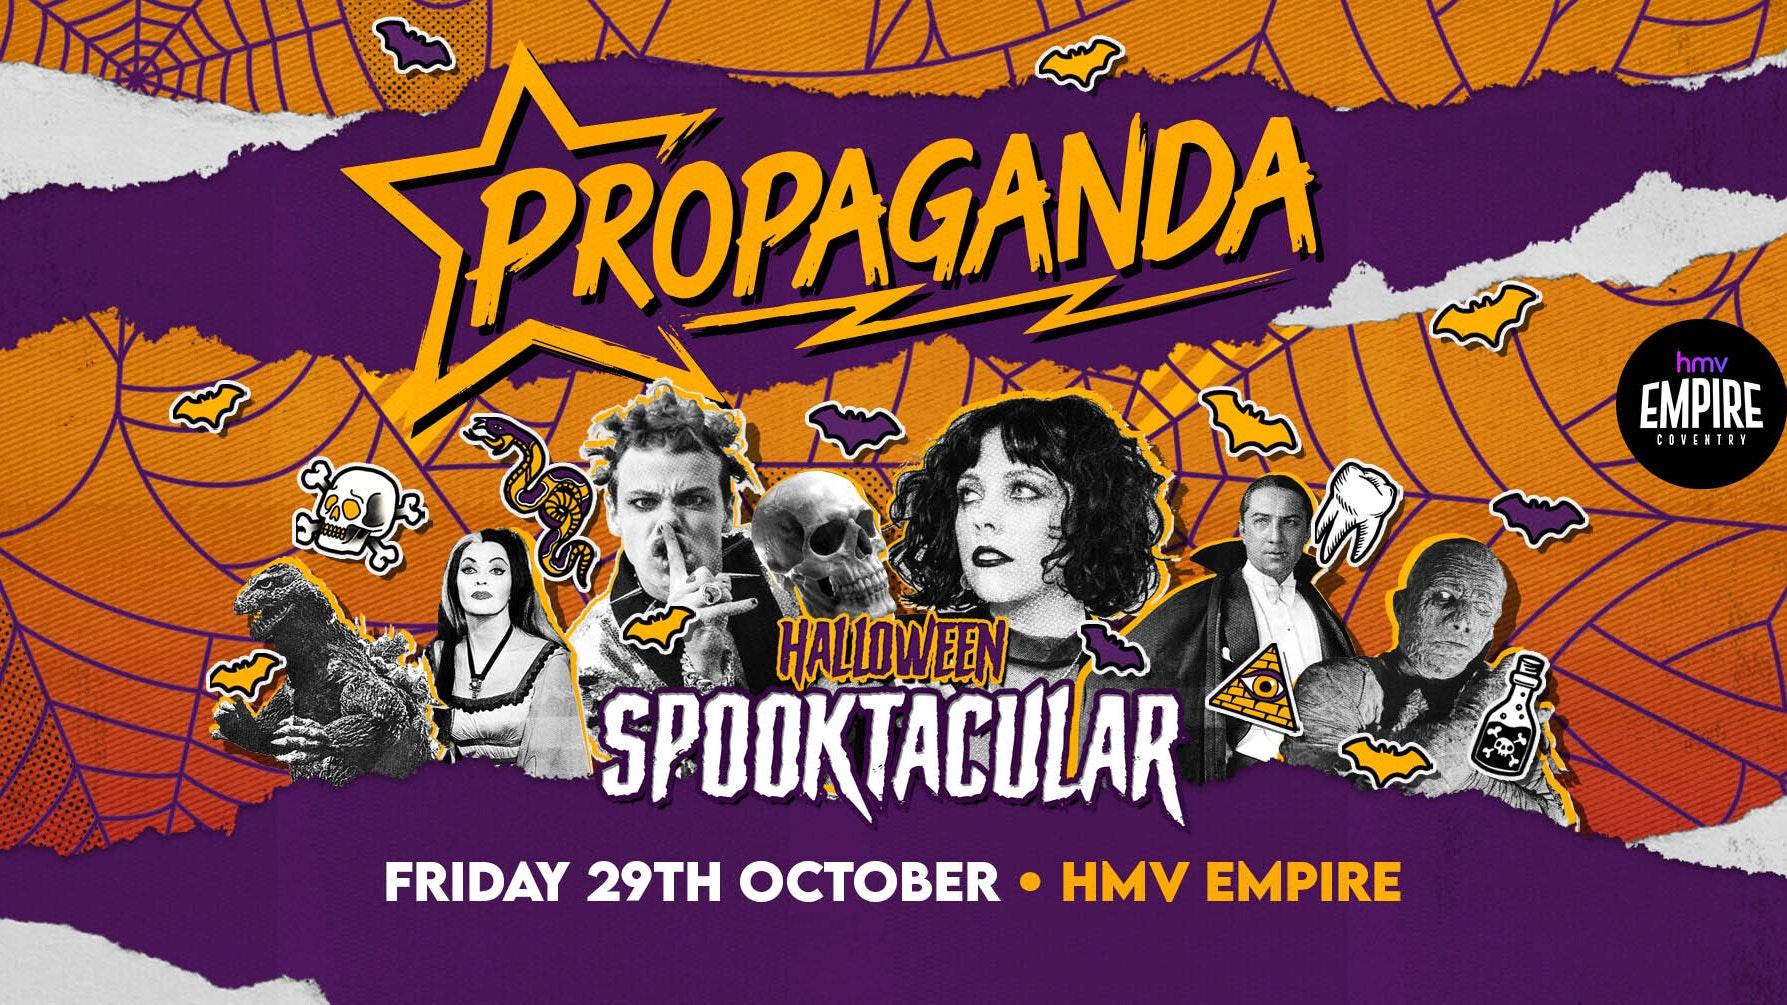 Propaganda Coventry –  Halloween Spooktacular!